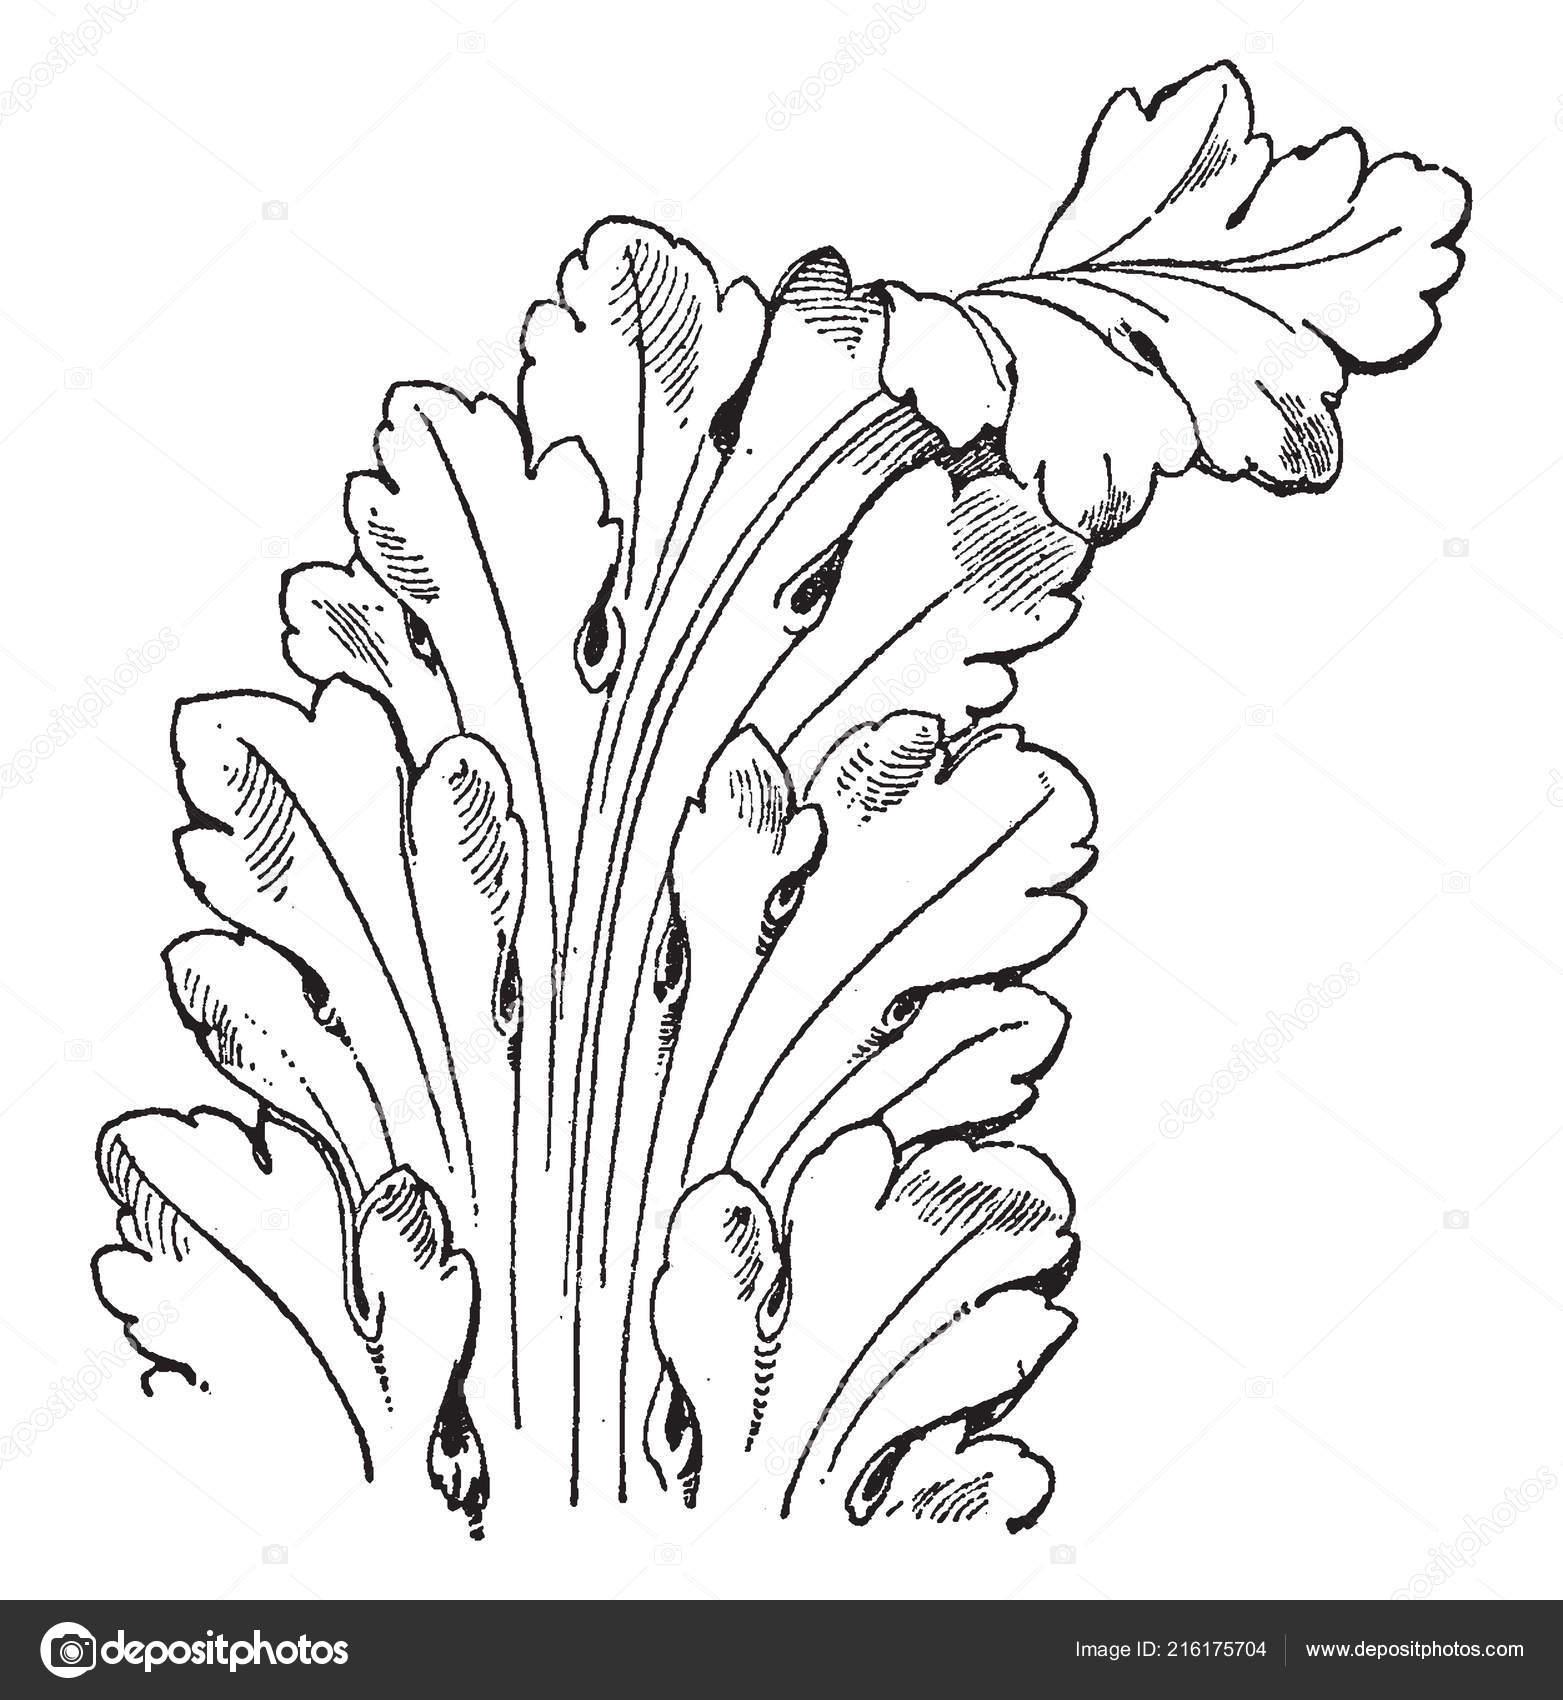 French Leaf Renaissance Long Leaves Pattern Vintage Line Drawing Engraving Stock Vector C Morphart 216175704